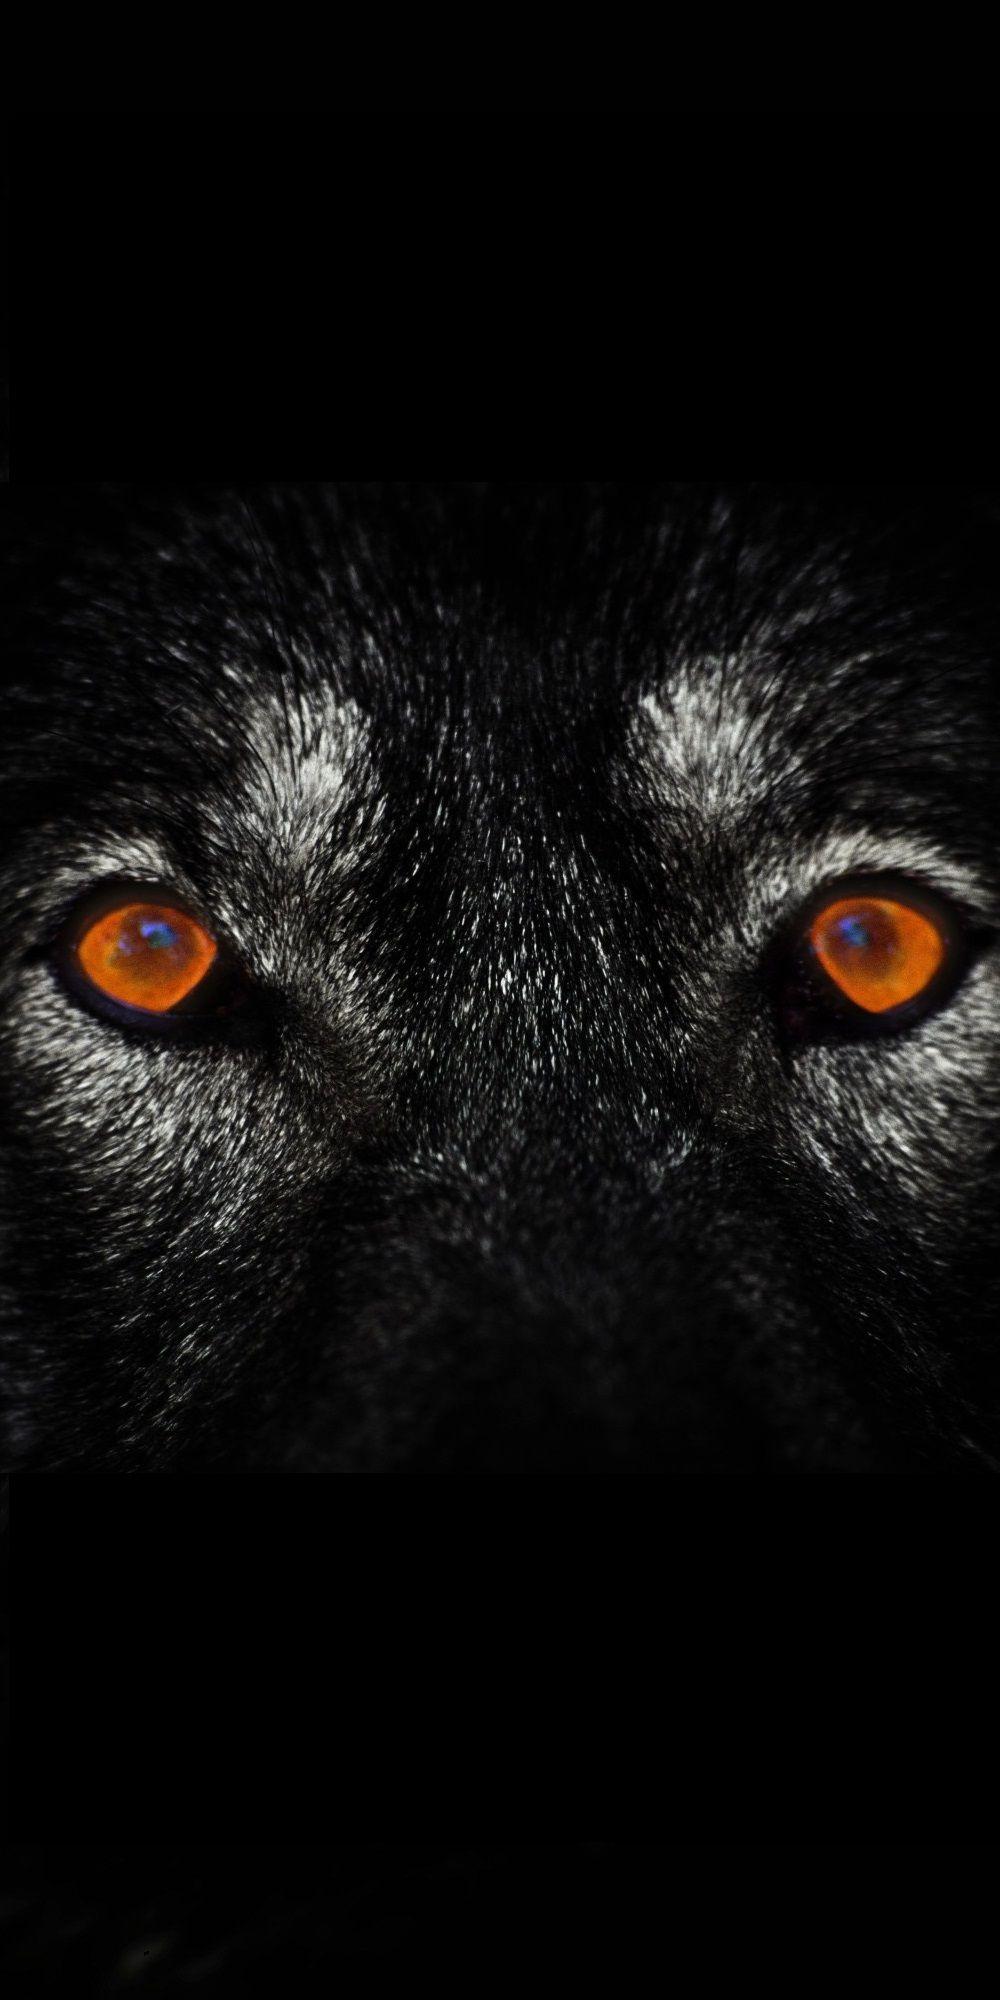 3d 4k Fbb Wallpaper Wolf Eyes Dark Iphone Wallpaper Iphonewallpapers